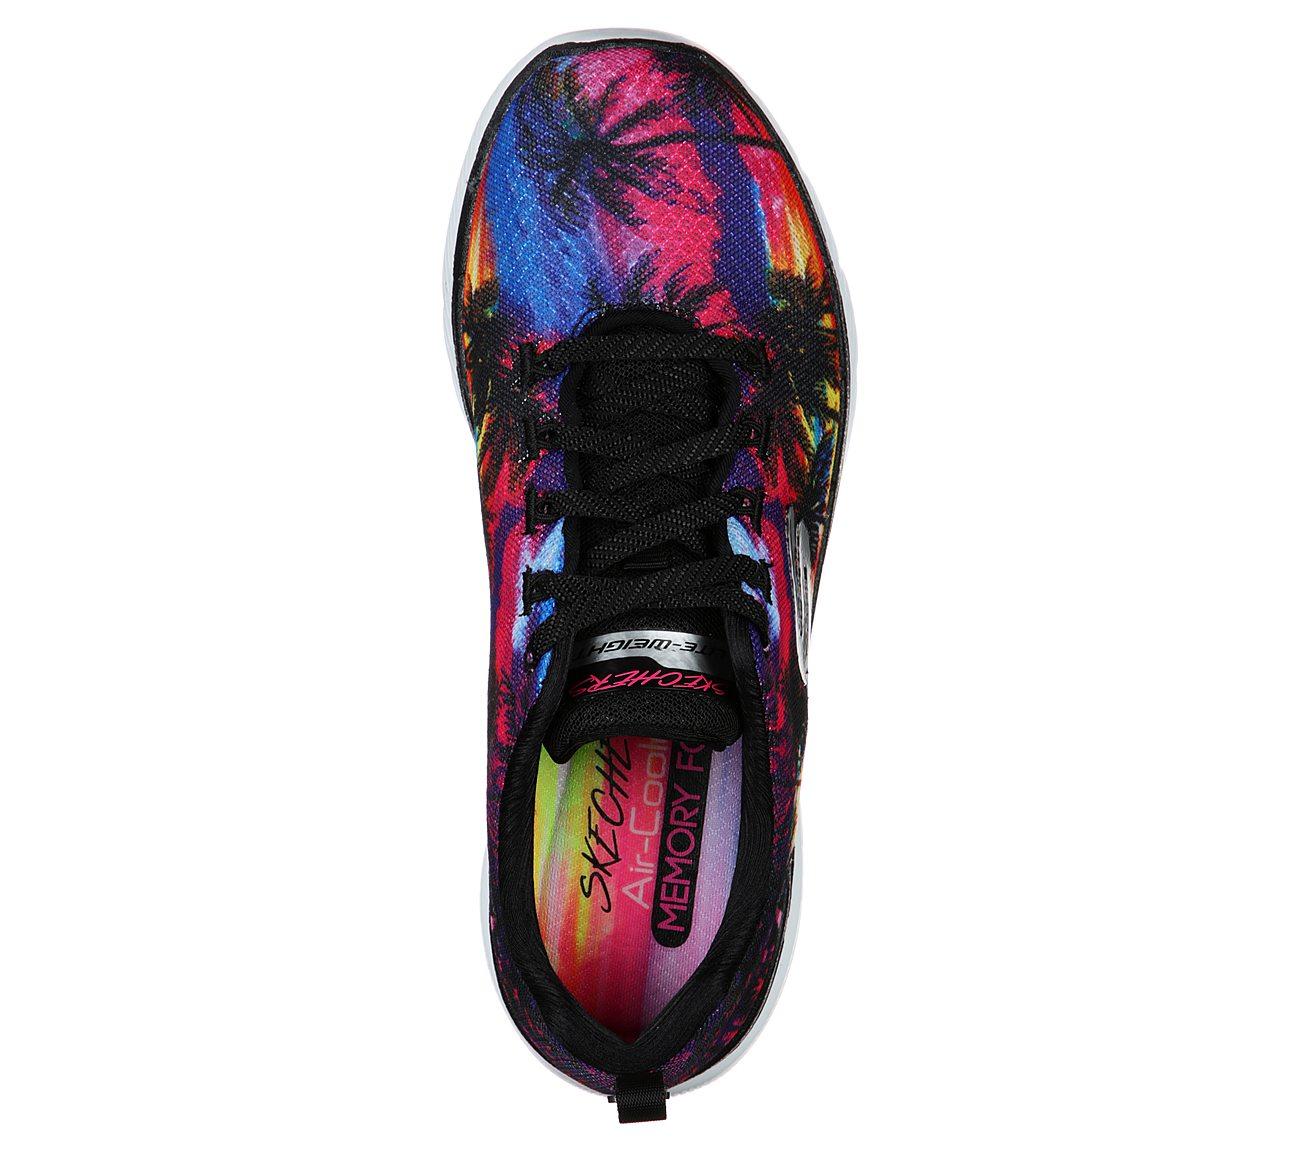 Marvelous Sunset Sport Shoes